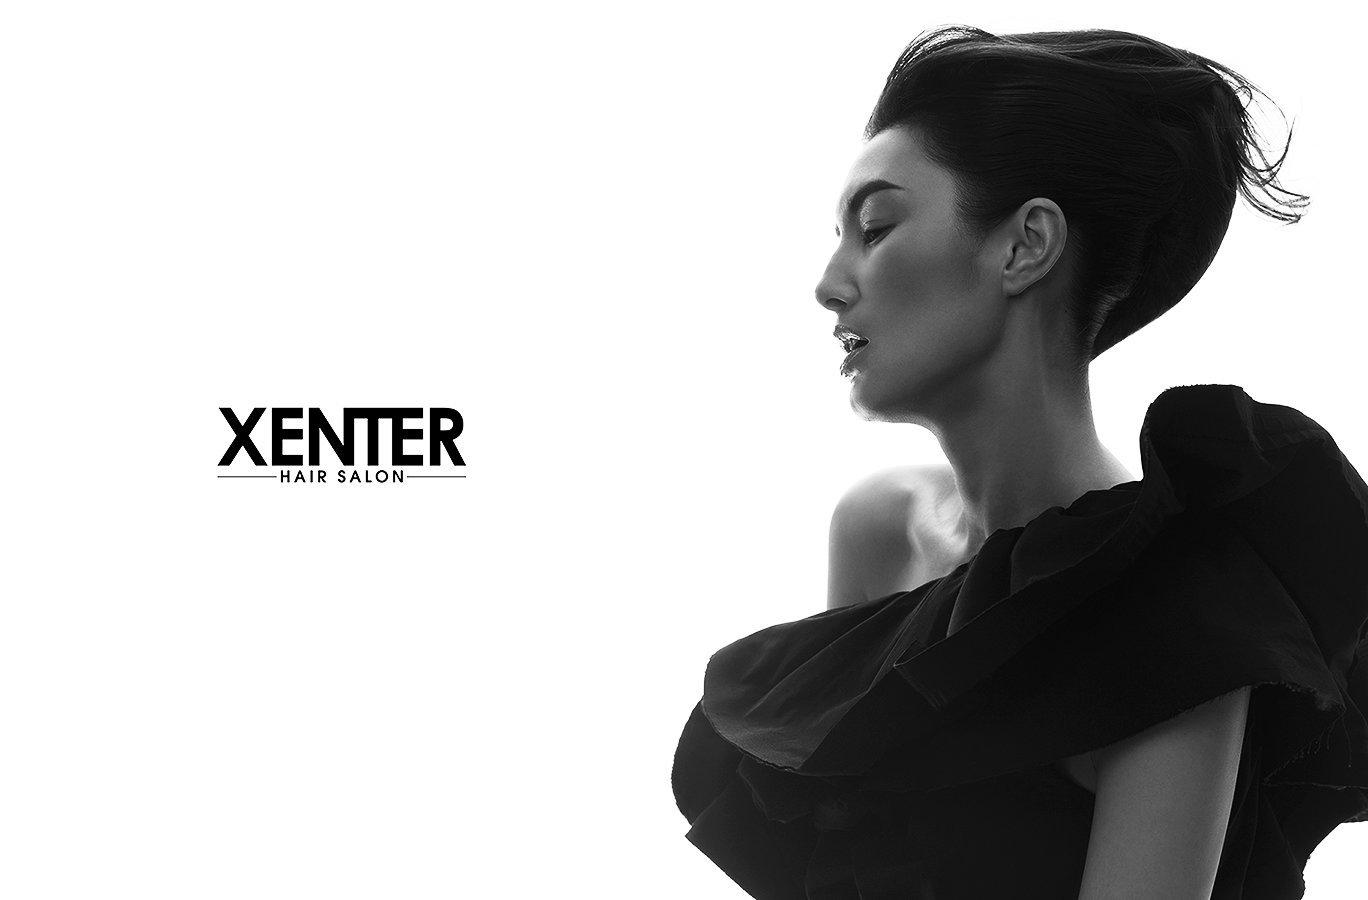 Xenter hair Salon Ad campaign